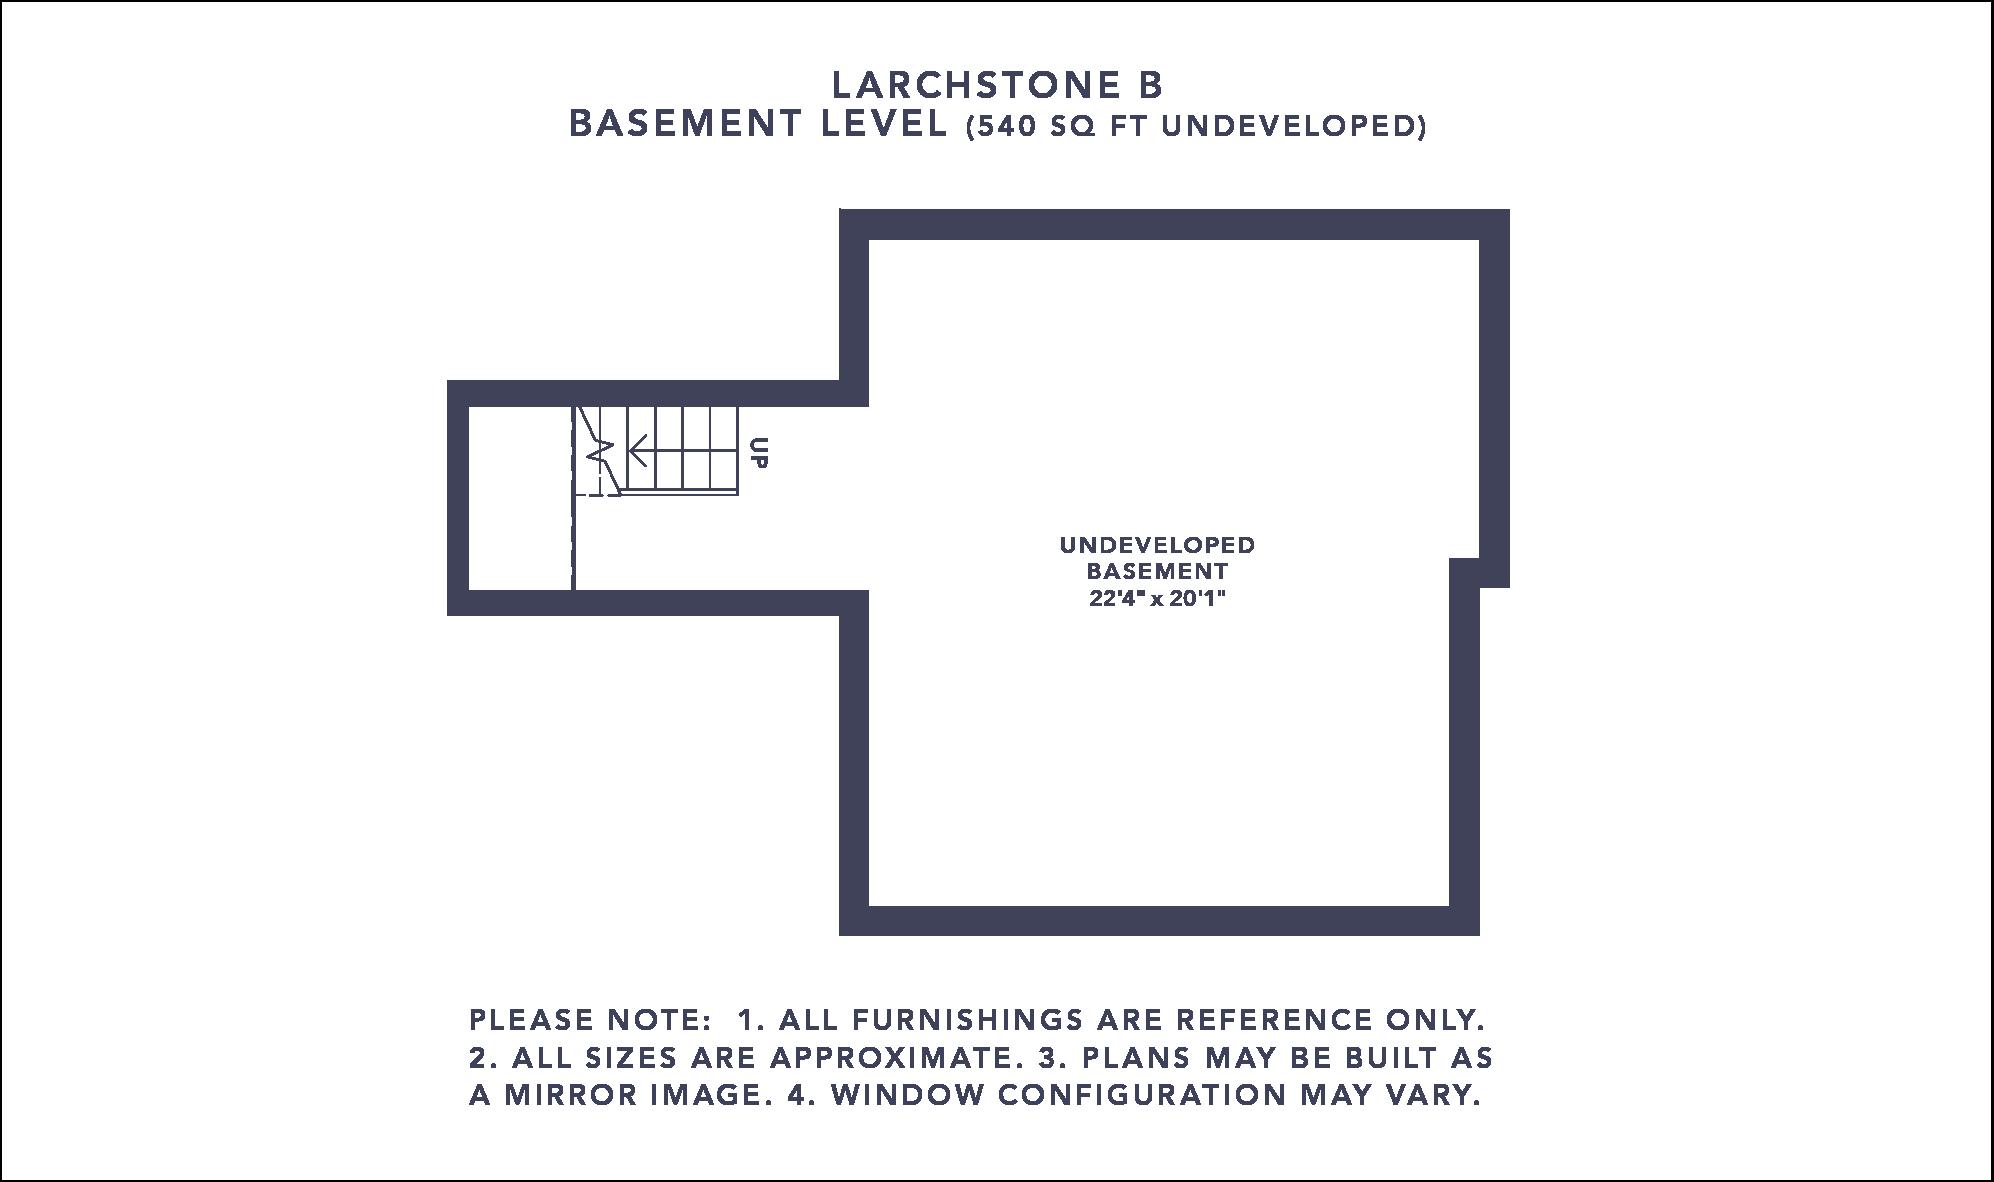 Larchstone B Floorplan - Basement Level